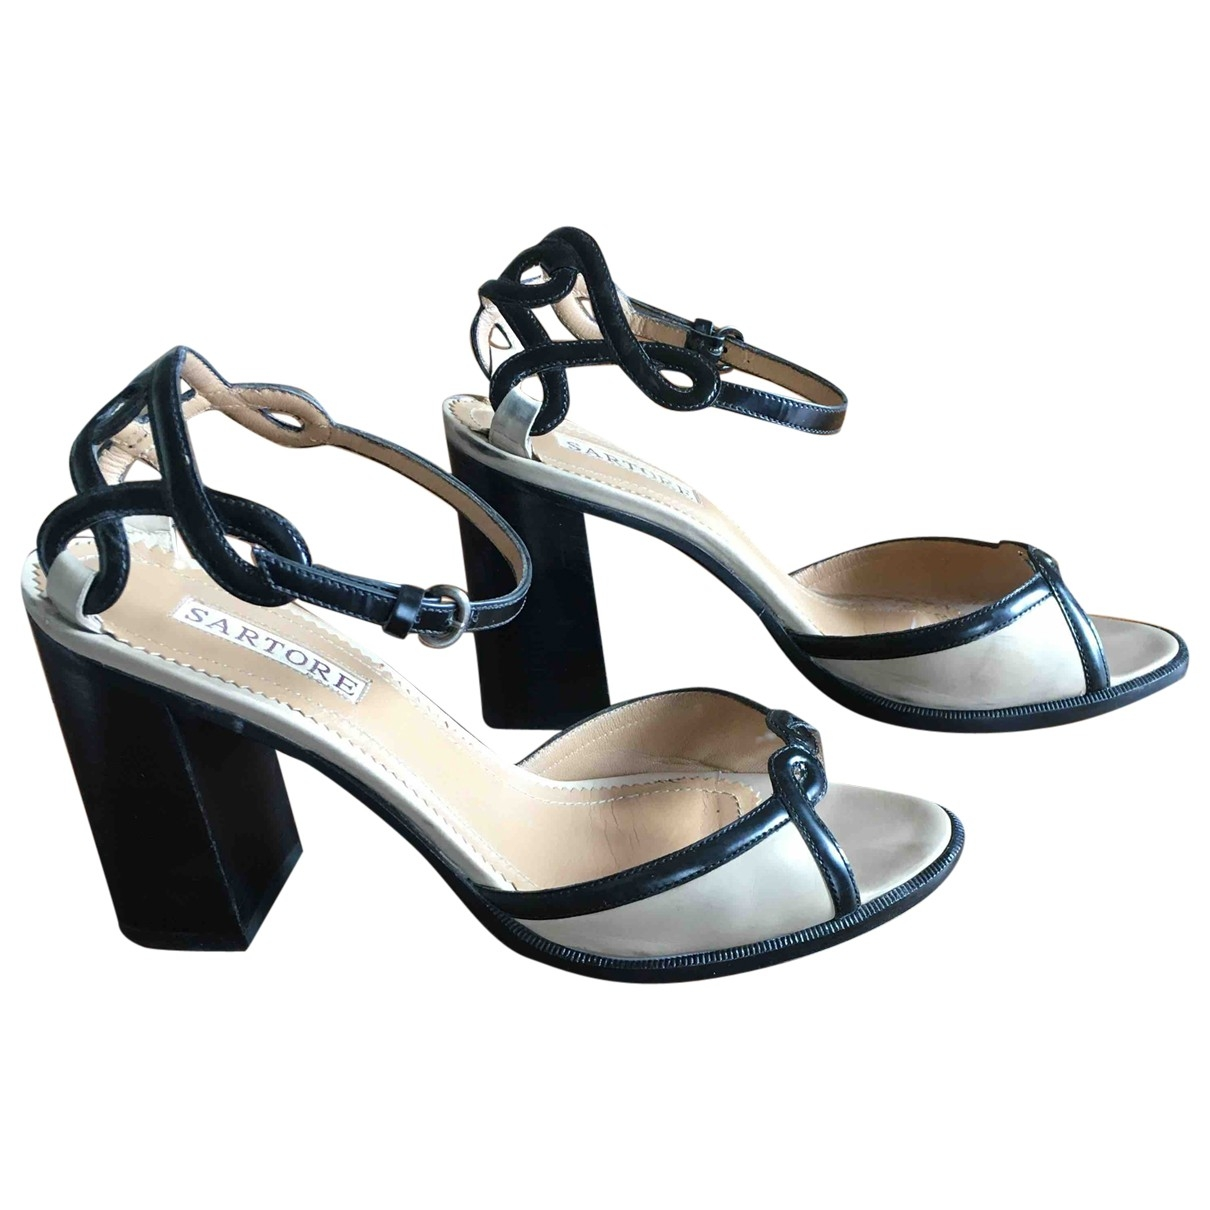 Sartore \N Beige Leather Sandals for Women 38 EU